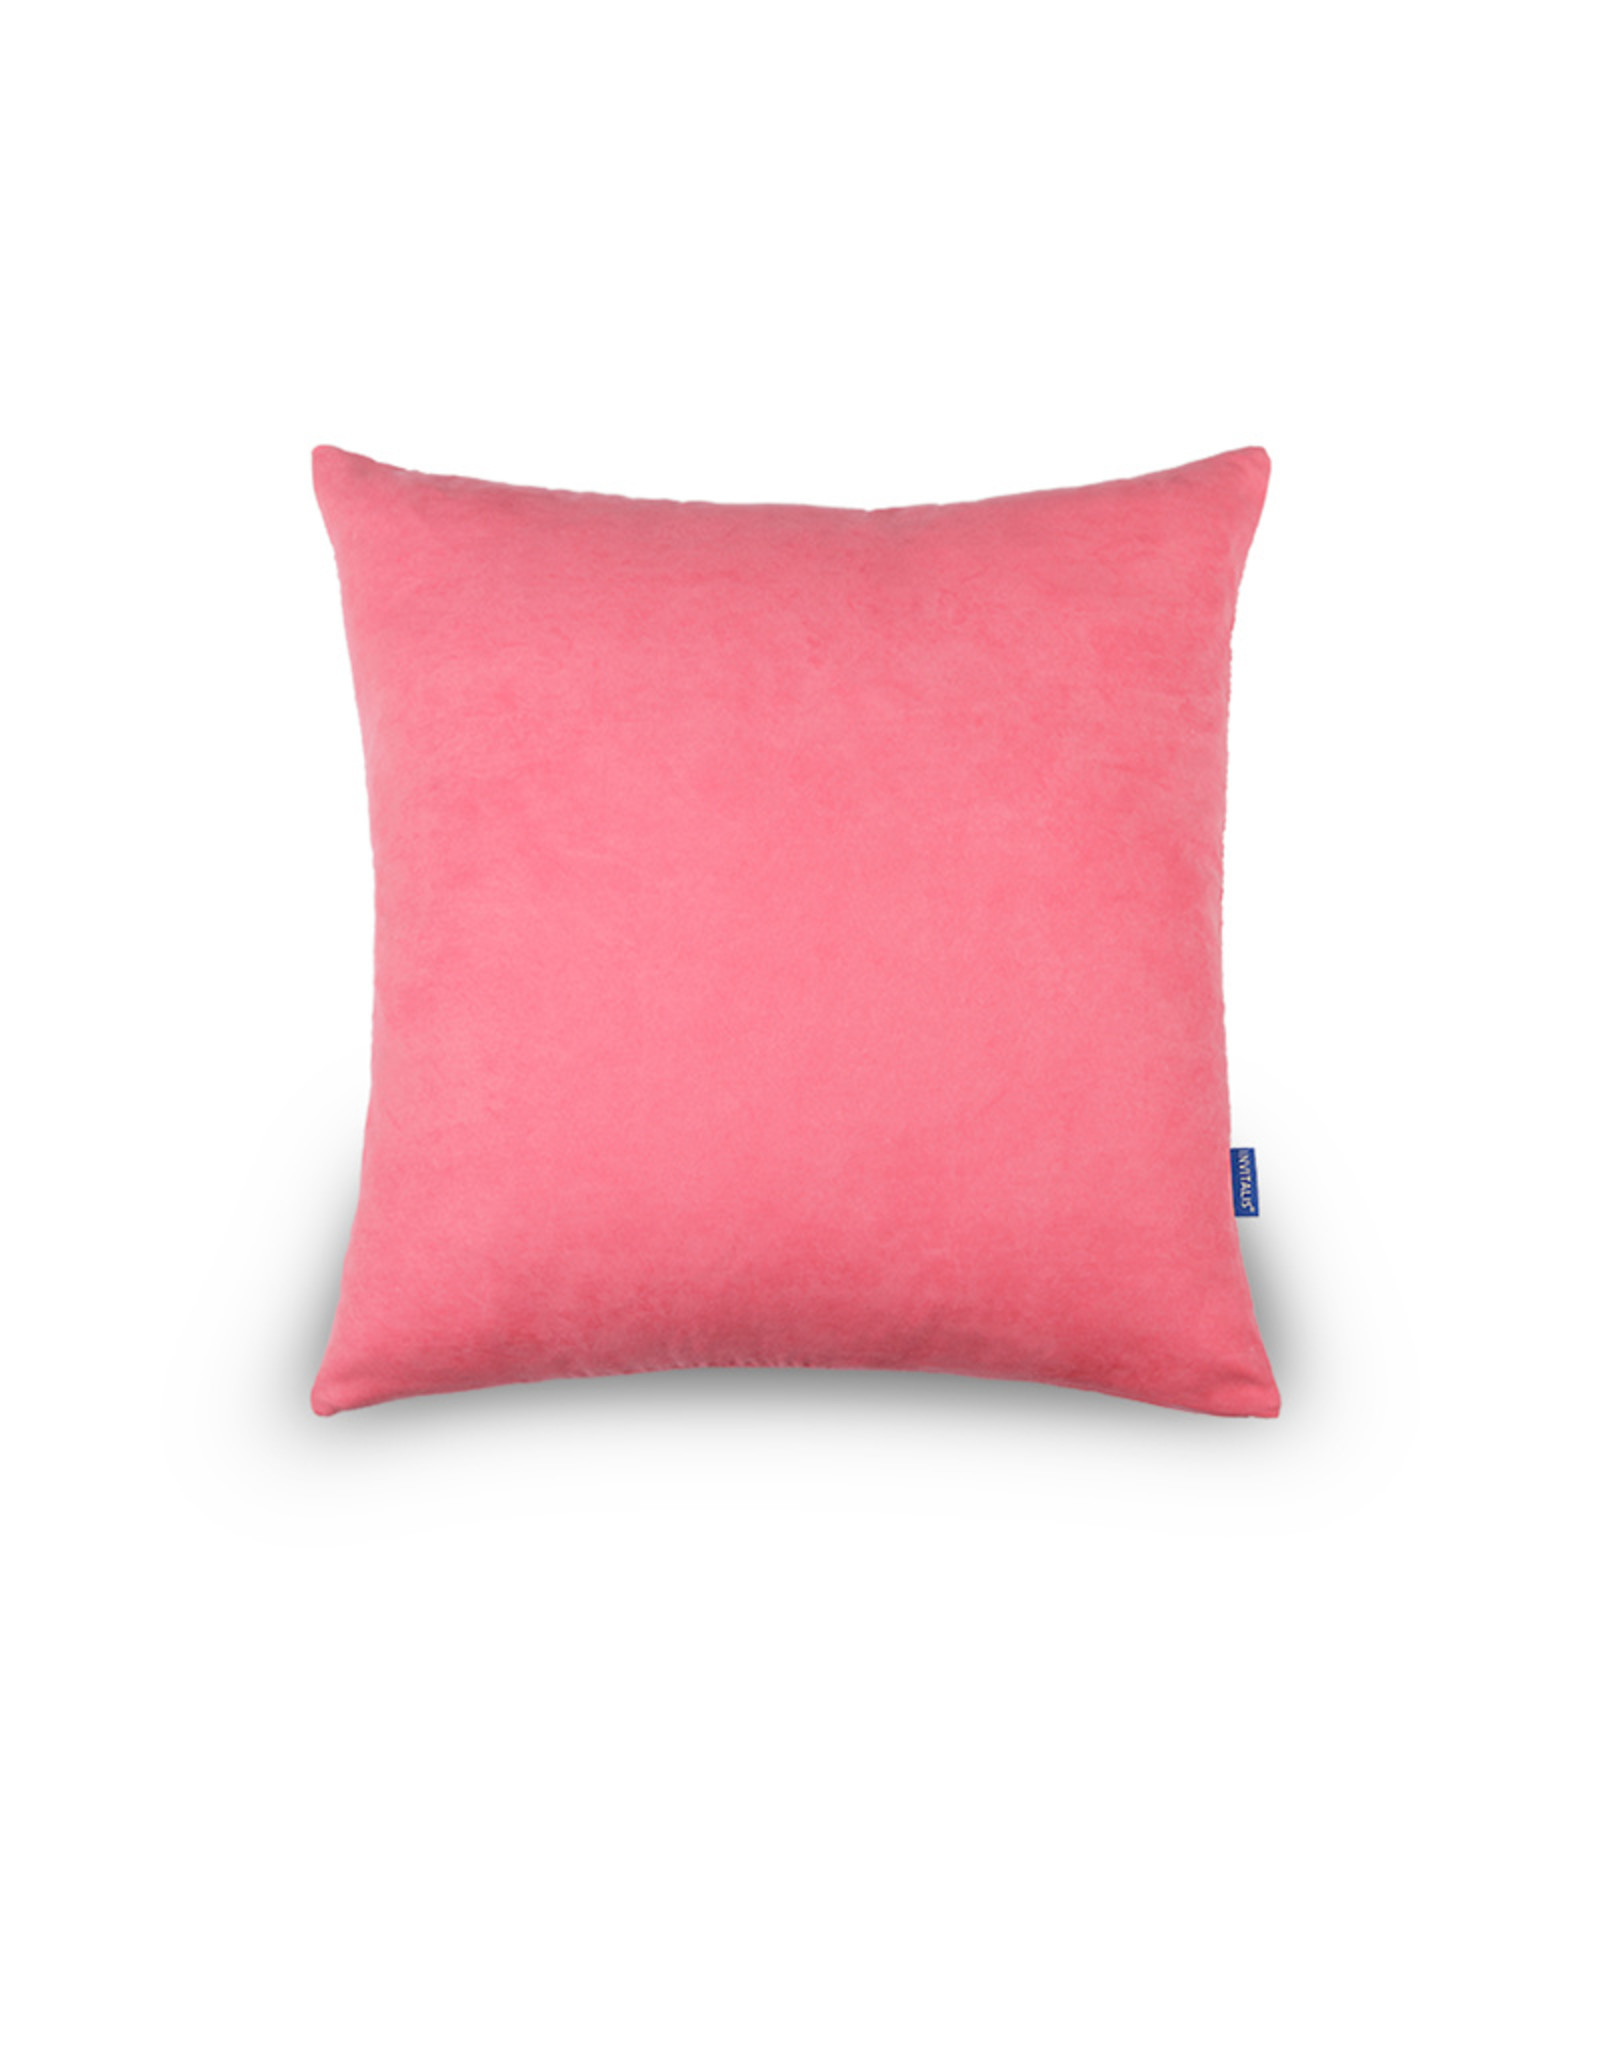 INVITALIS Vitalymed Soft - Rose